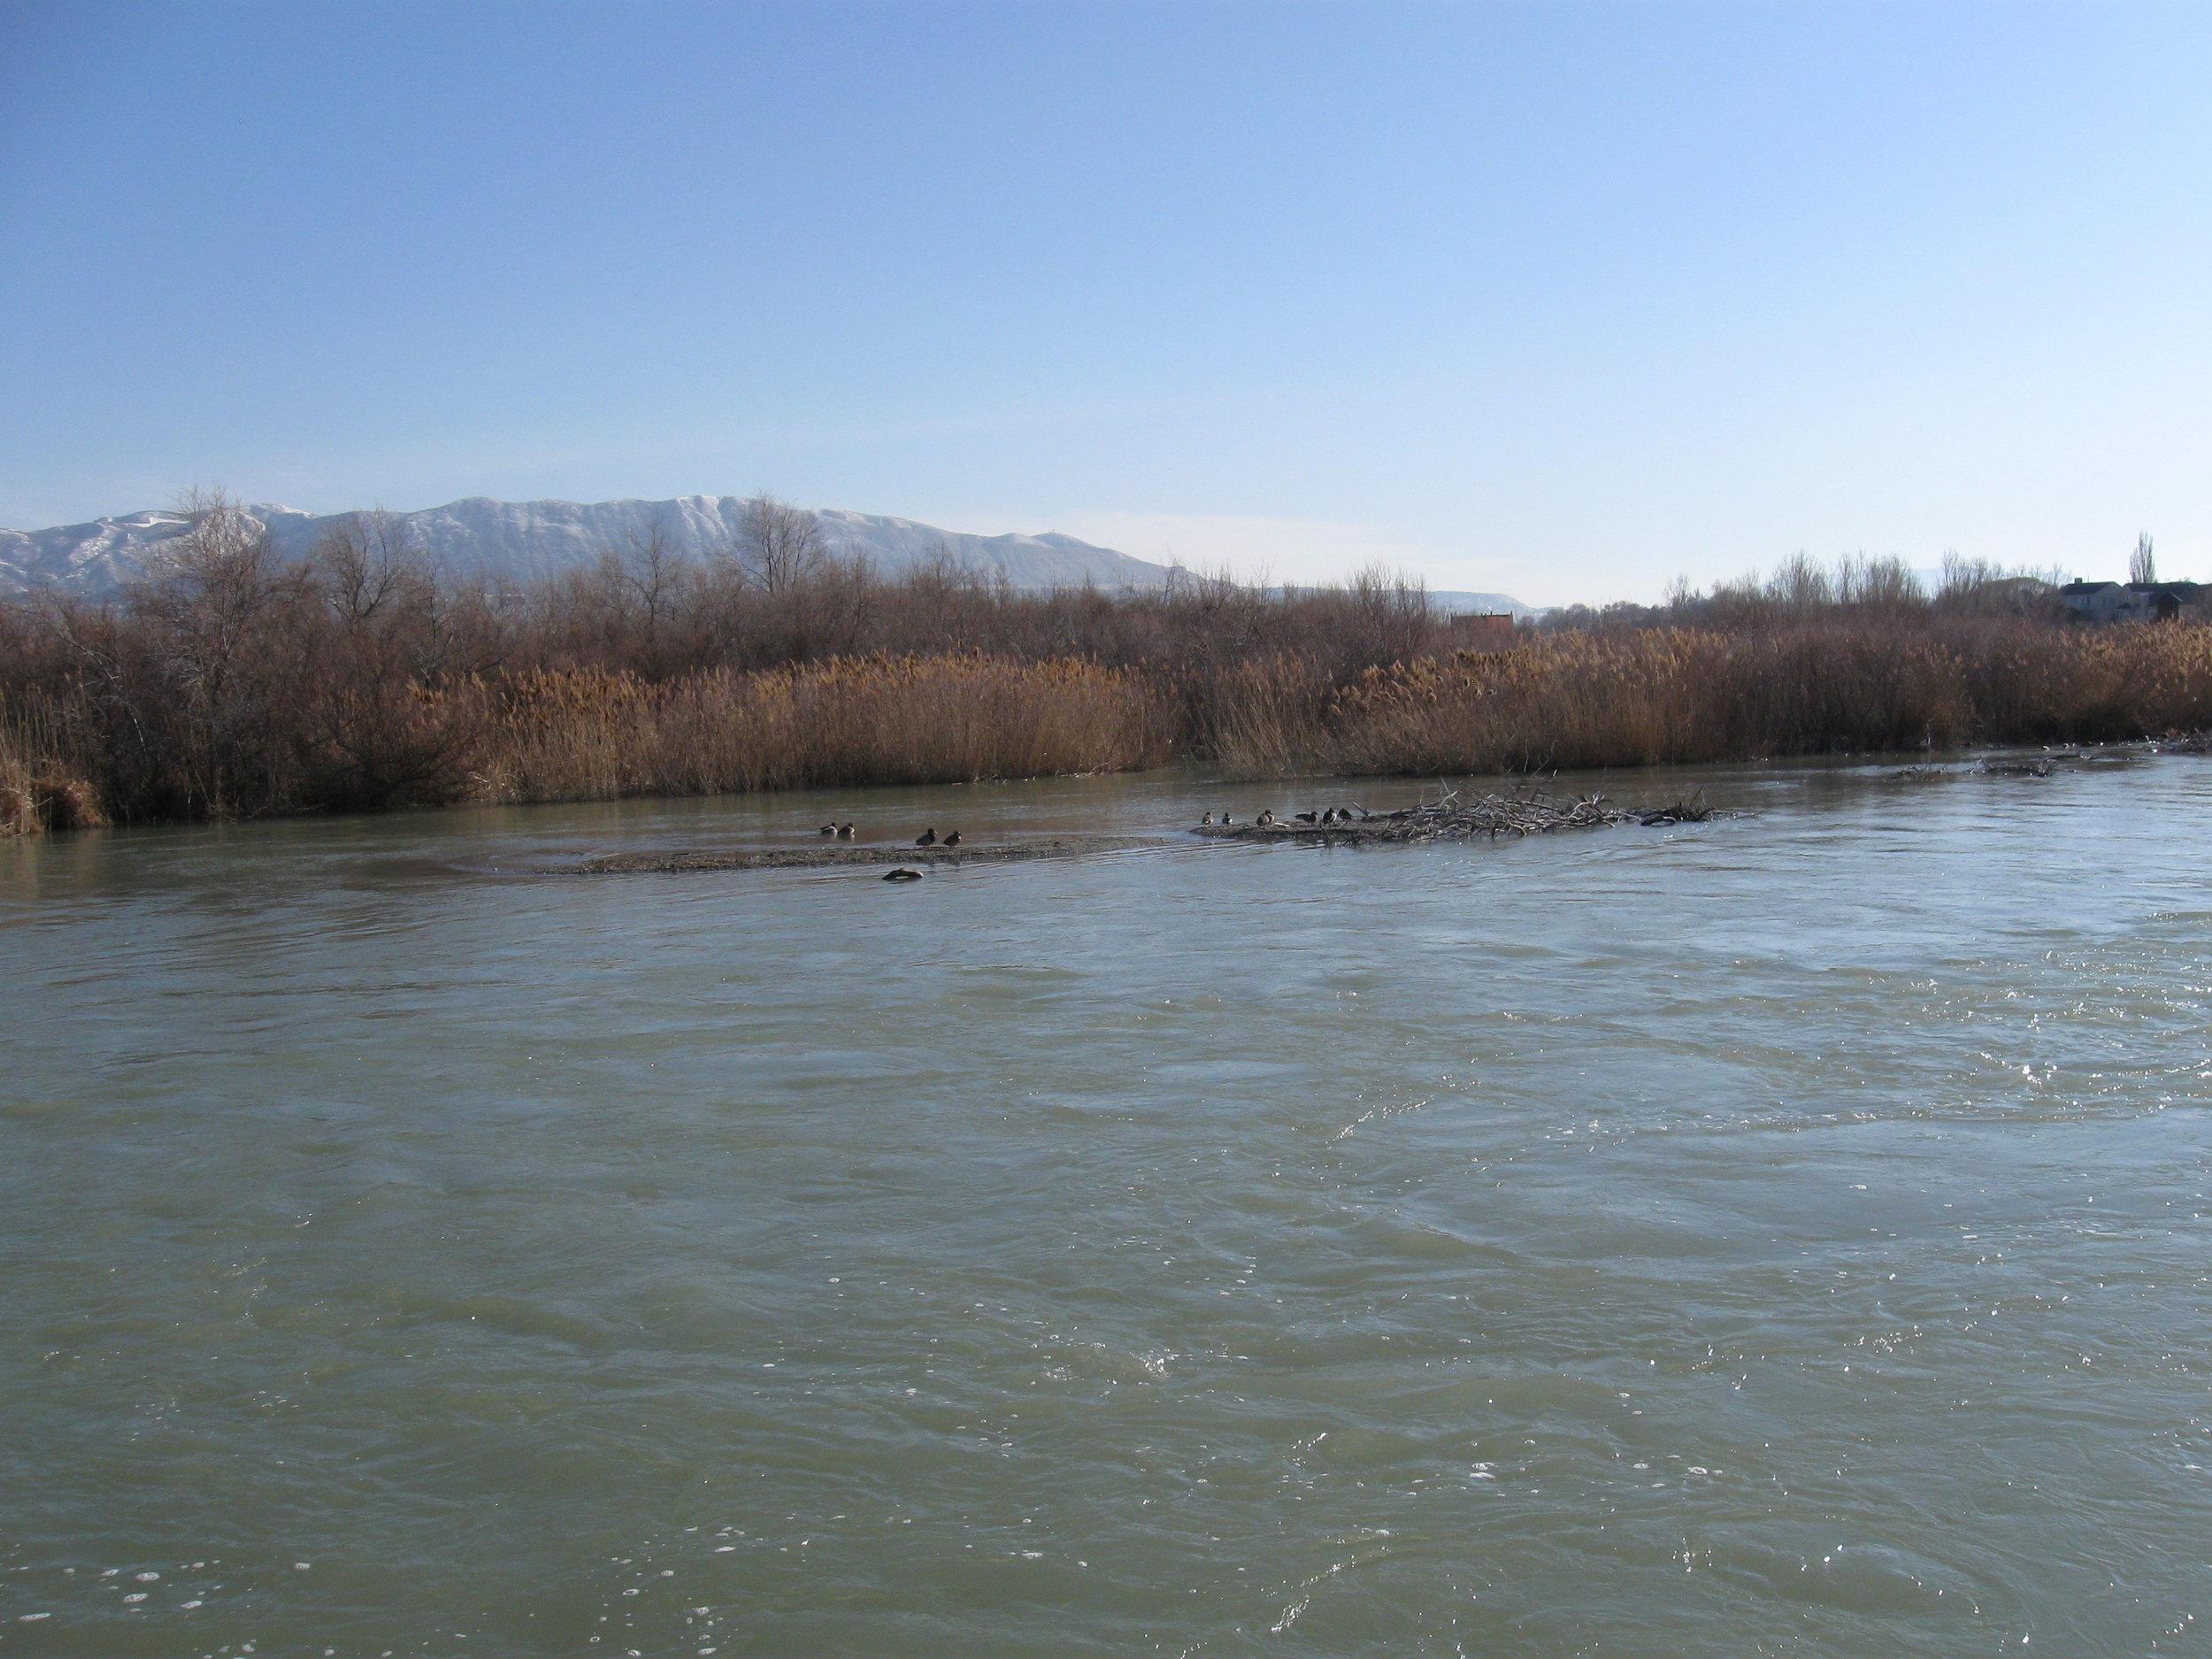 Jordan River+reeds on shoreline.JPG